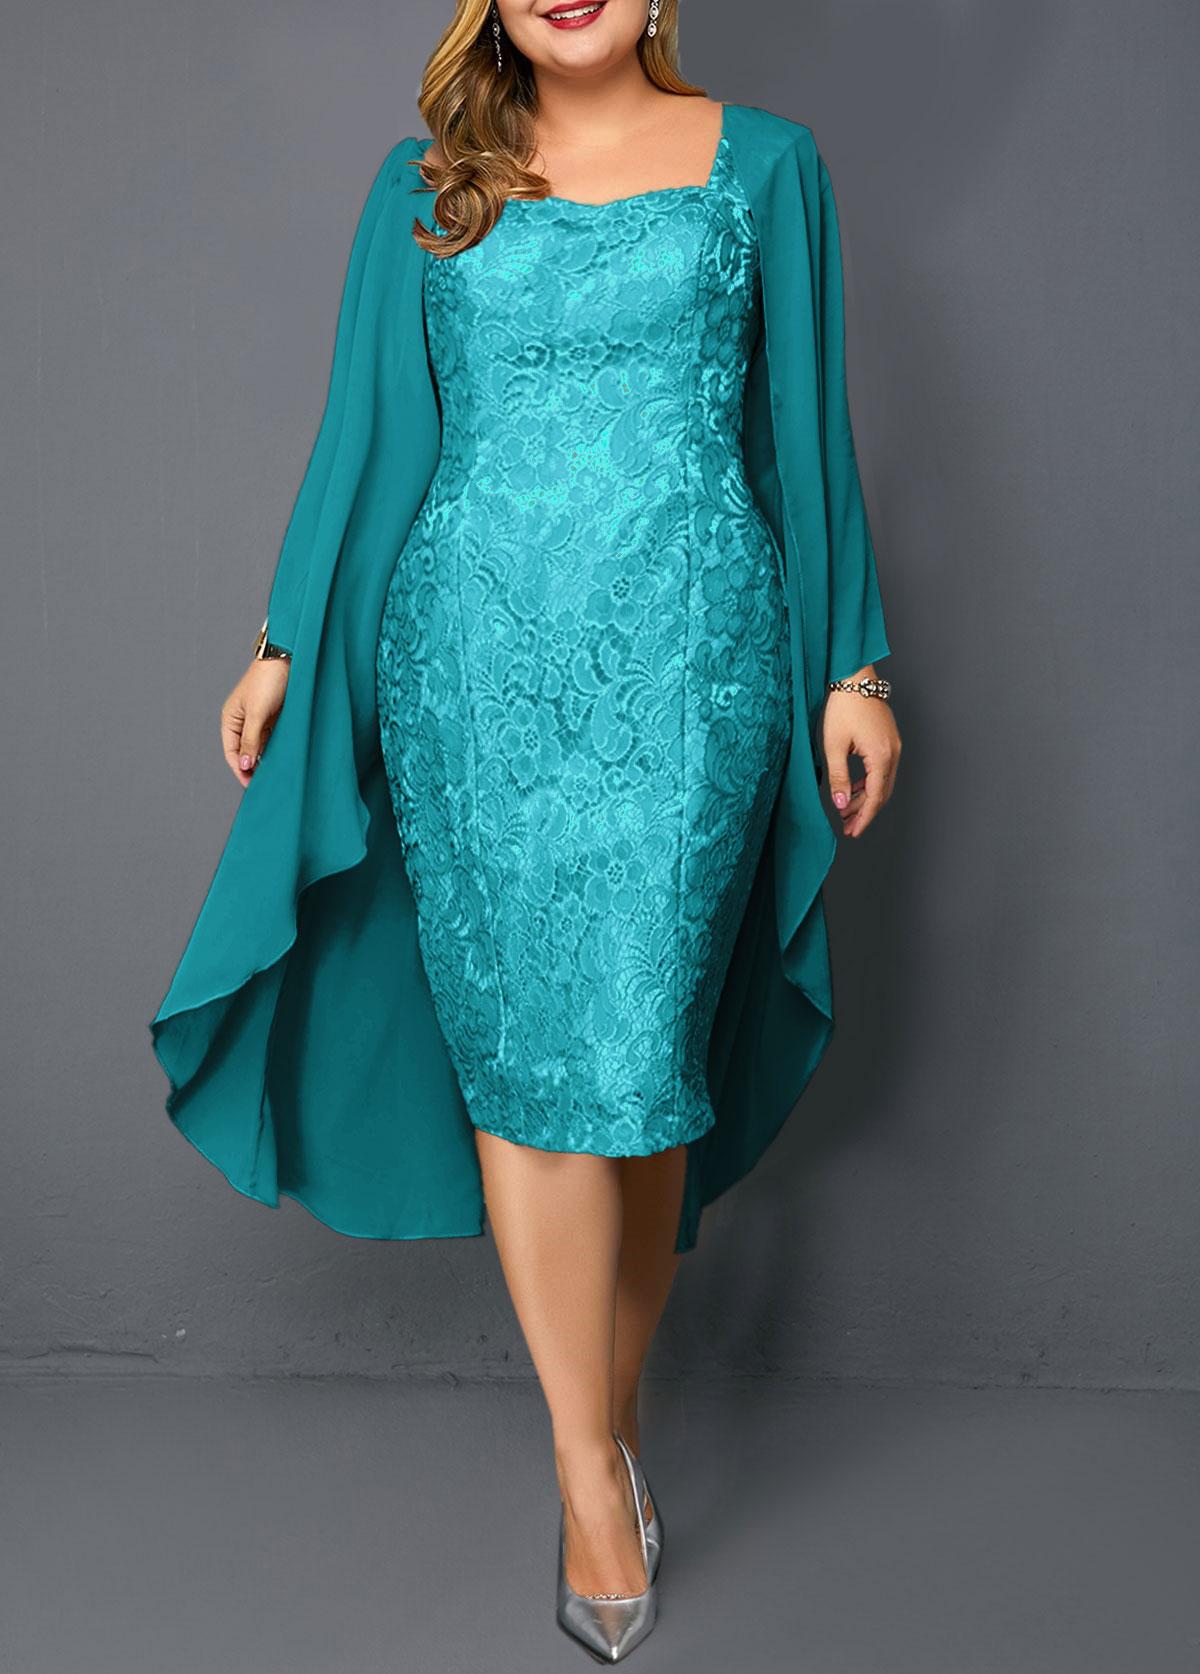 Plus Size Chiffon Cardigan and Turquoise Sleeveless Lace Dress